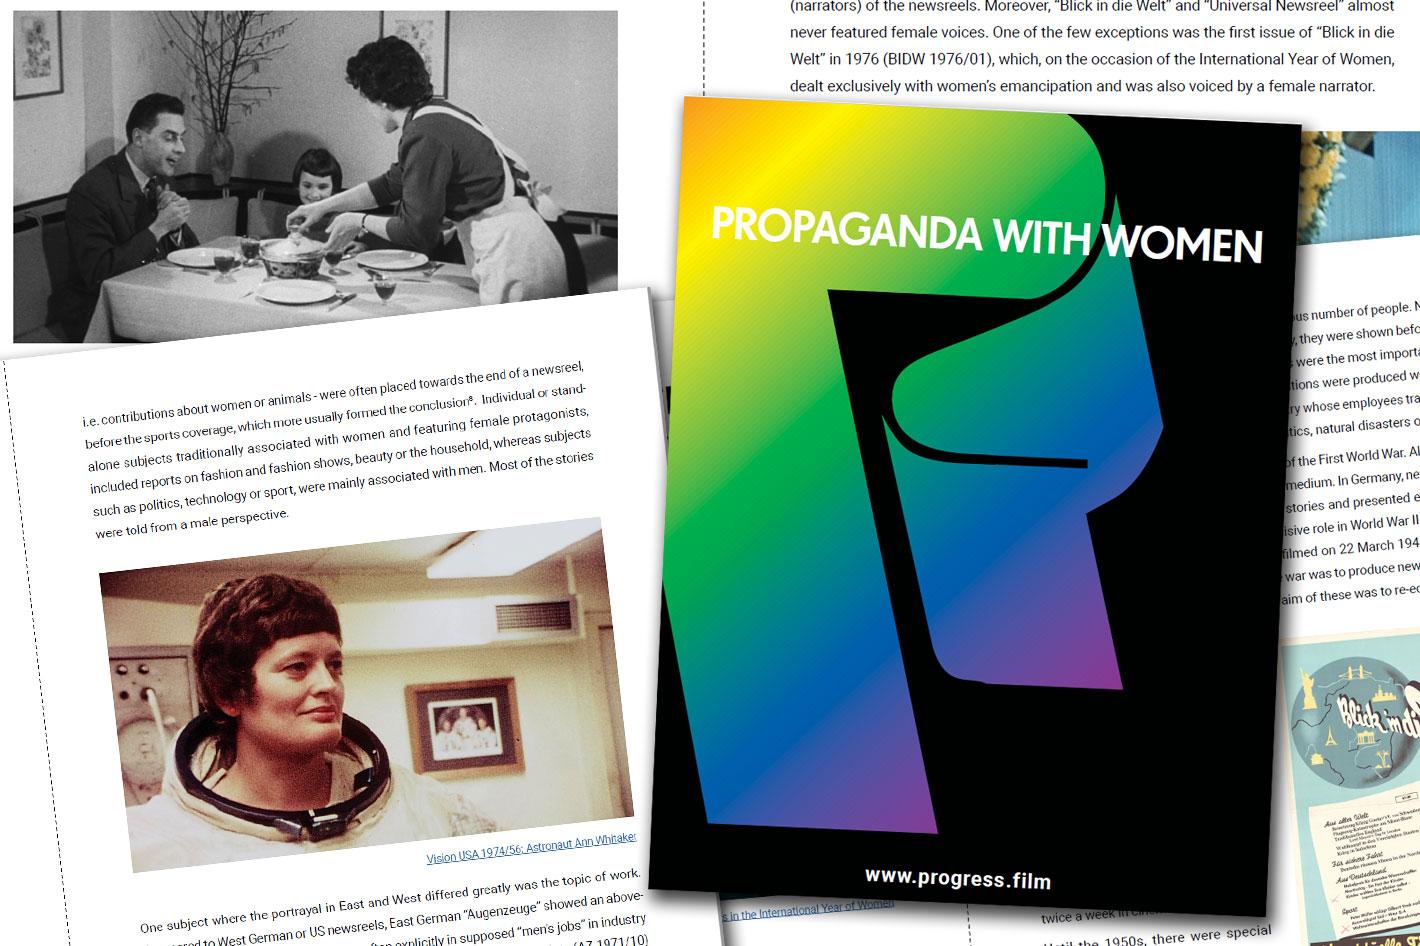 PROGRESS releases a white paper on Femininity in Cold War Cinema